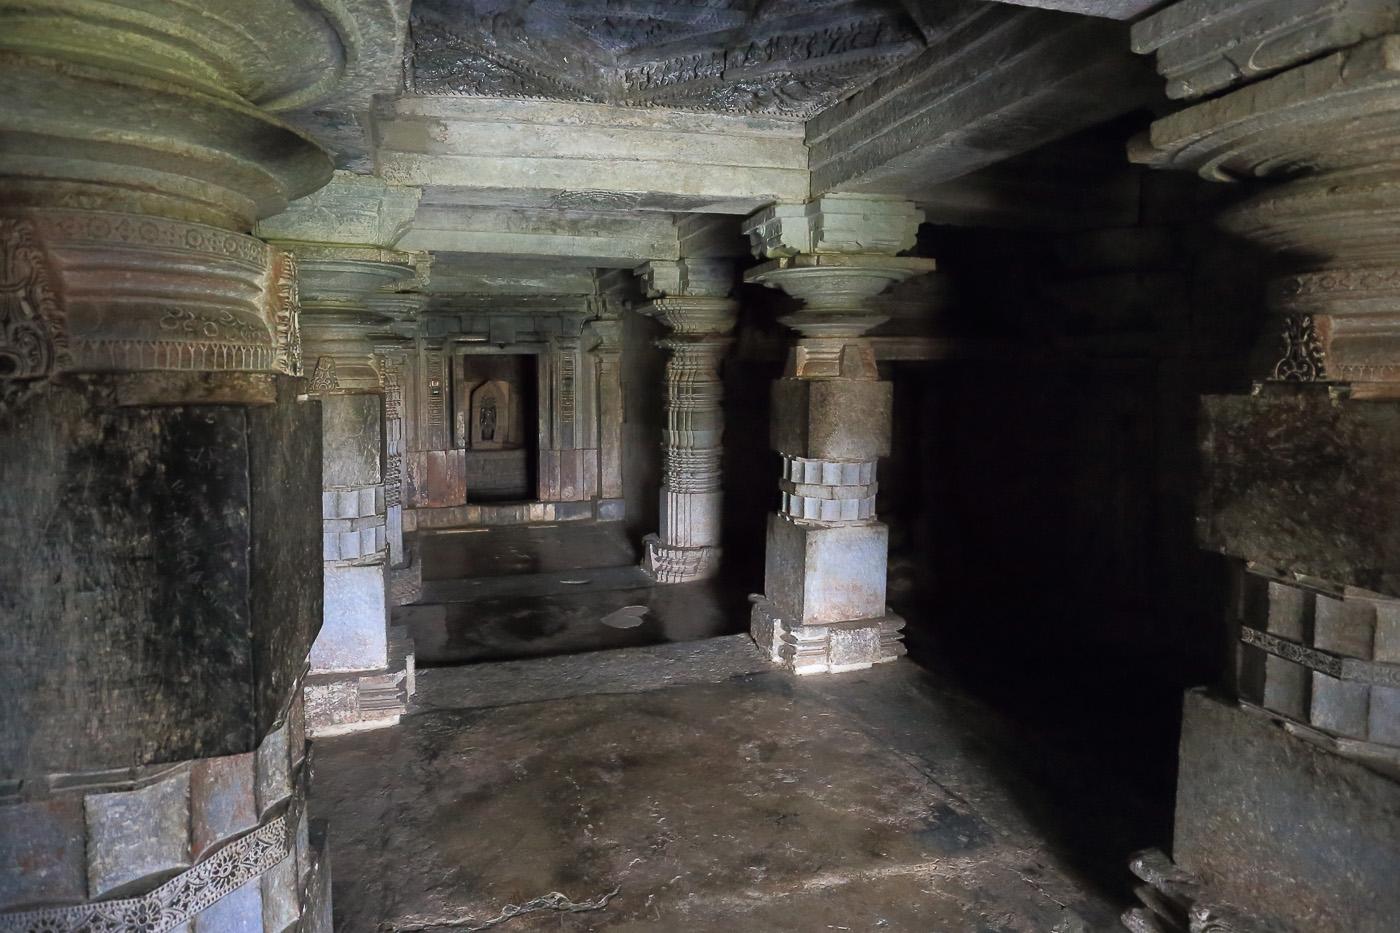 Фото №14. Храмы Halebeedu Basadi Digambar Jain Temples. Зал перед алтарем тиртханкара Андинатха. 1/40, -1 eV, f 6.3, 17mm, ISO 12800.